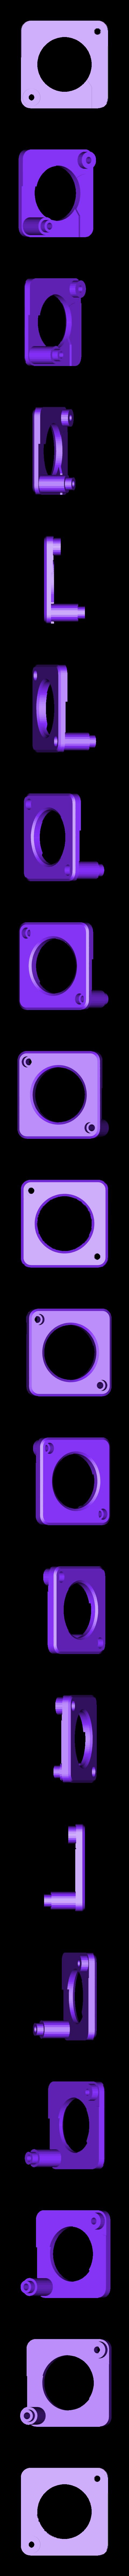 Flexistruder_cover_mk8.stl Download free STL file FlexiStruder - GARIX version for mk8 drive gear • 3D printable model, Chaco